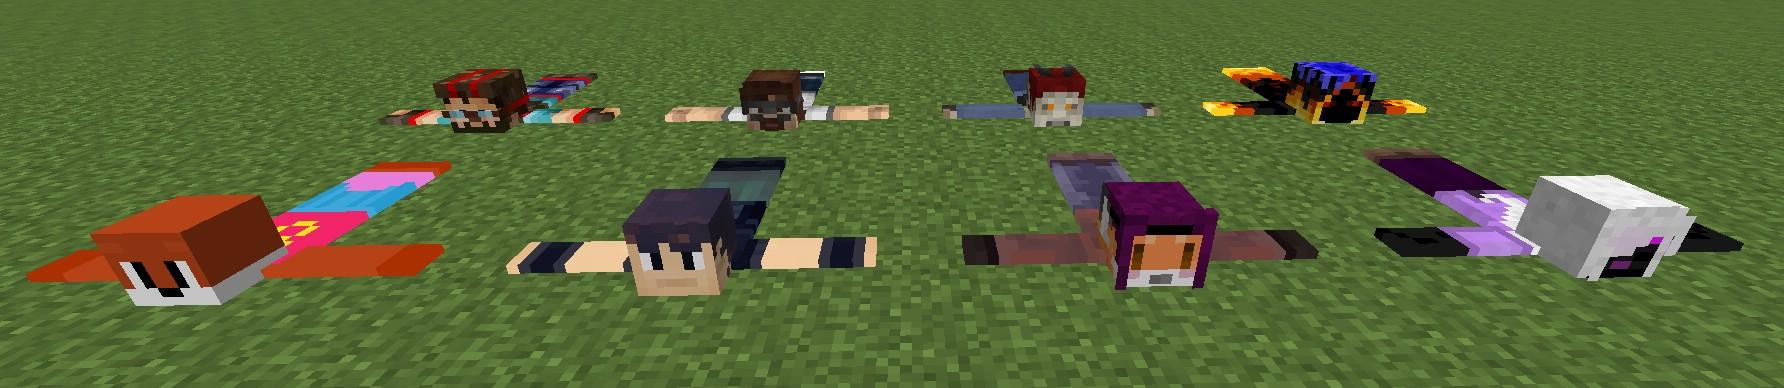 Player-Rugs-Mod-1.jpg